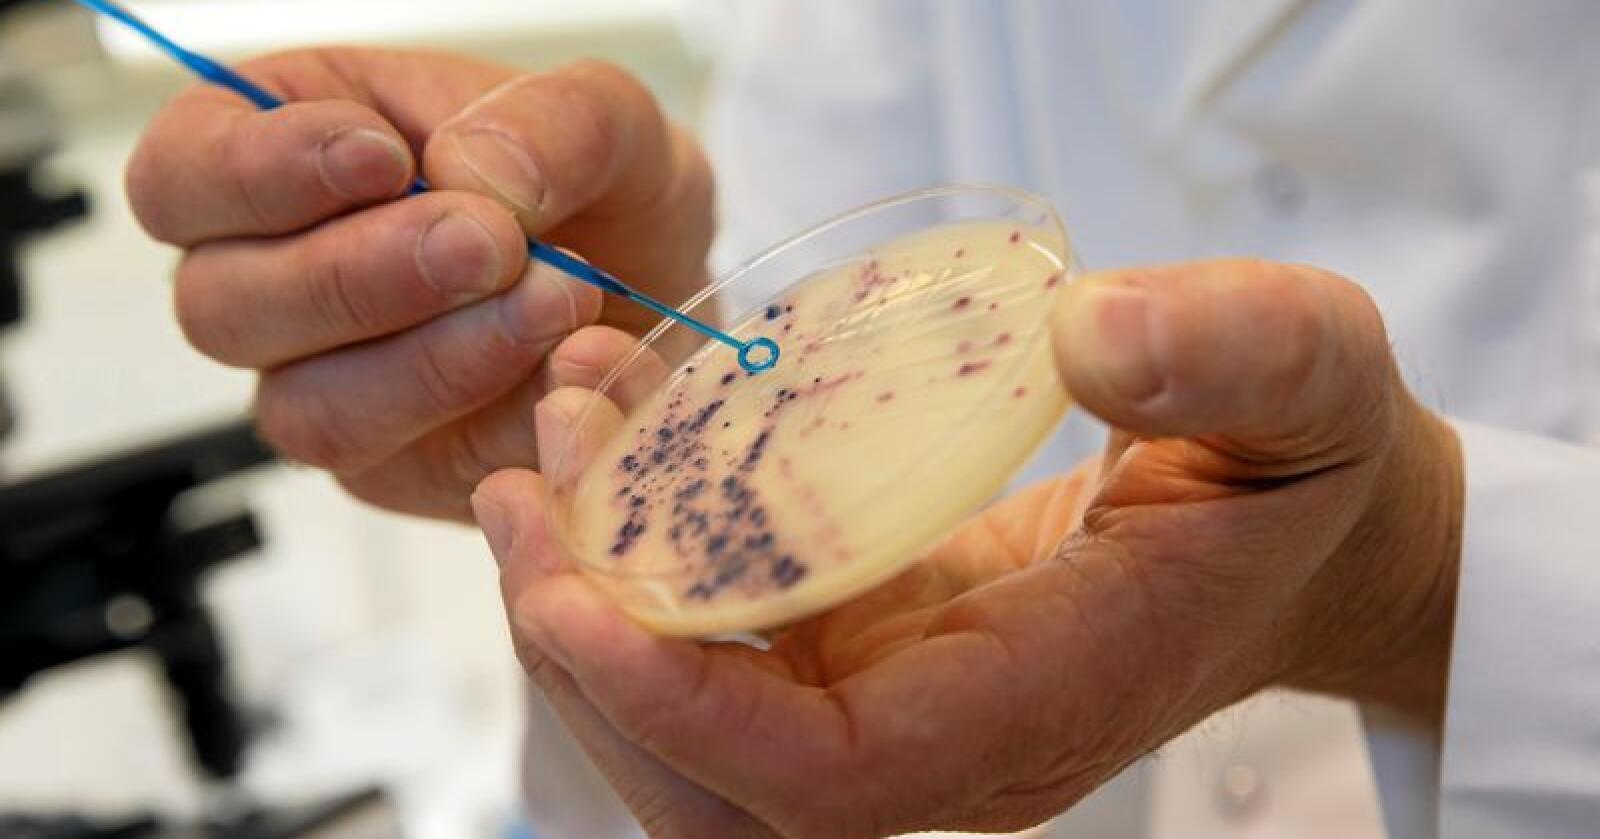 Resistens: Antibiotikaresistente bakterier i laboratoriet på Veterinærinstituttet i Oslo.  Foto: Cornelius Poppe/NTB scanpix